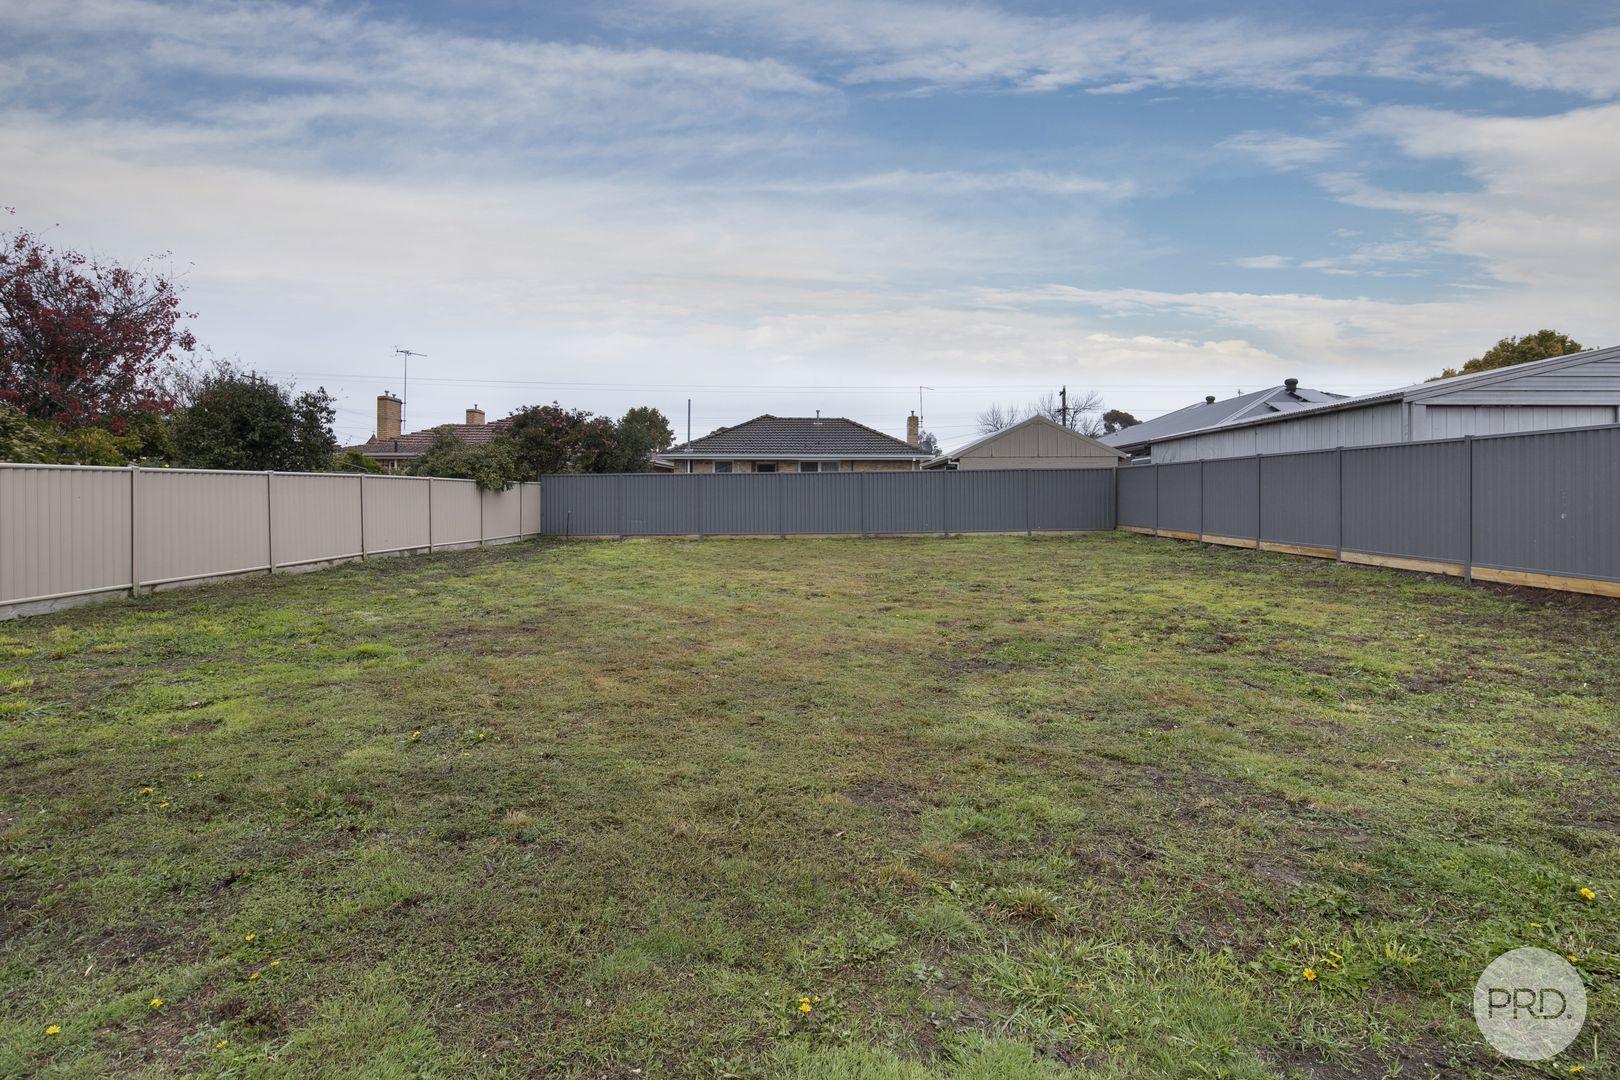 Lot 2/75 Clunes Road, Creswick VIC 3363, Image 1